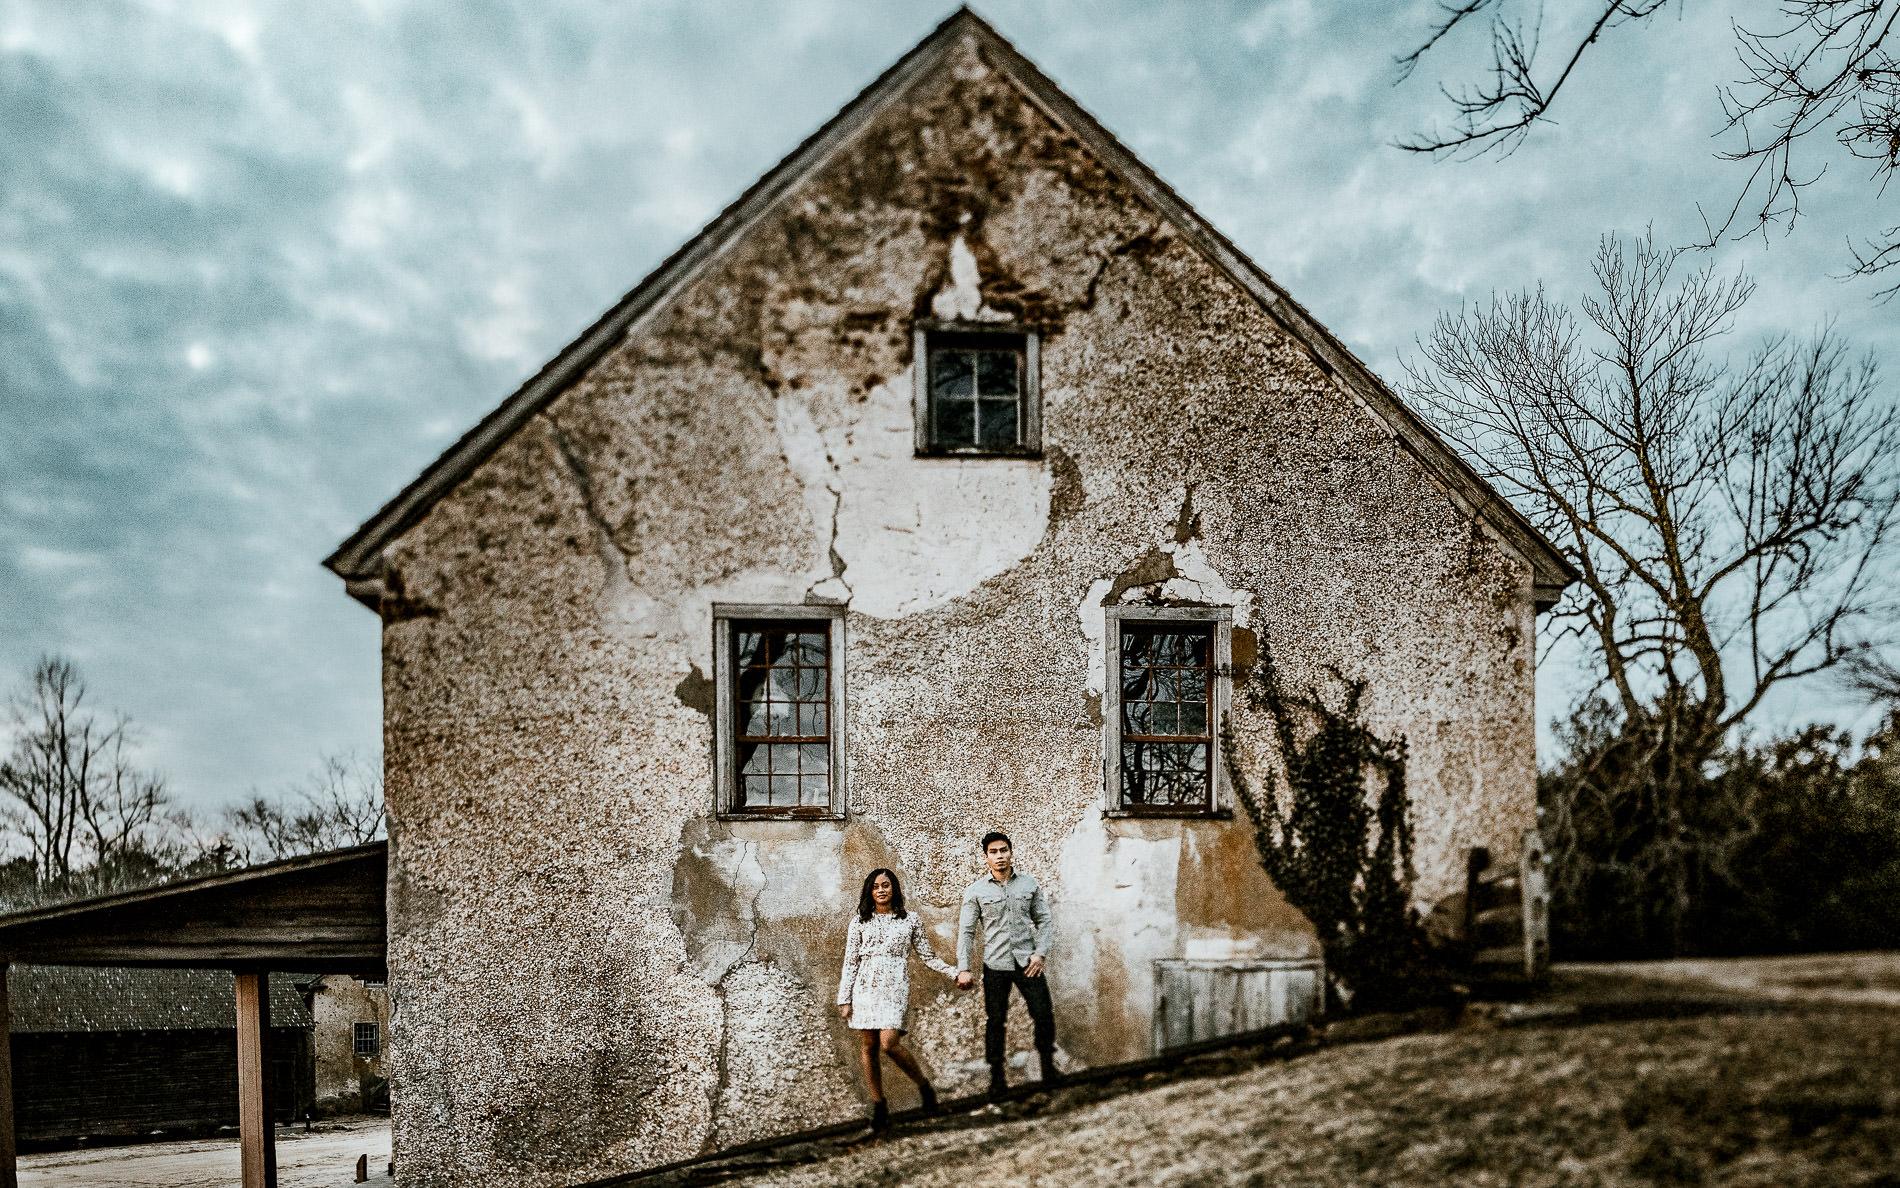 Twisted-oaks-studio-philadelphia-wedding-photographer-74.jpg